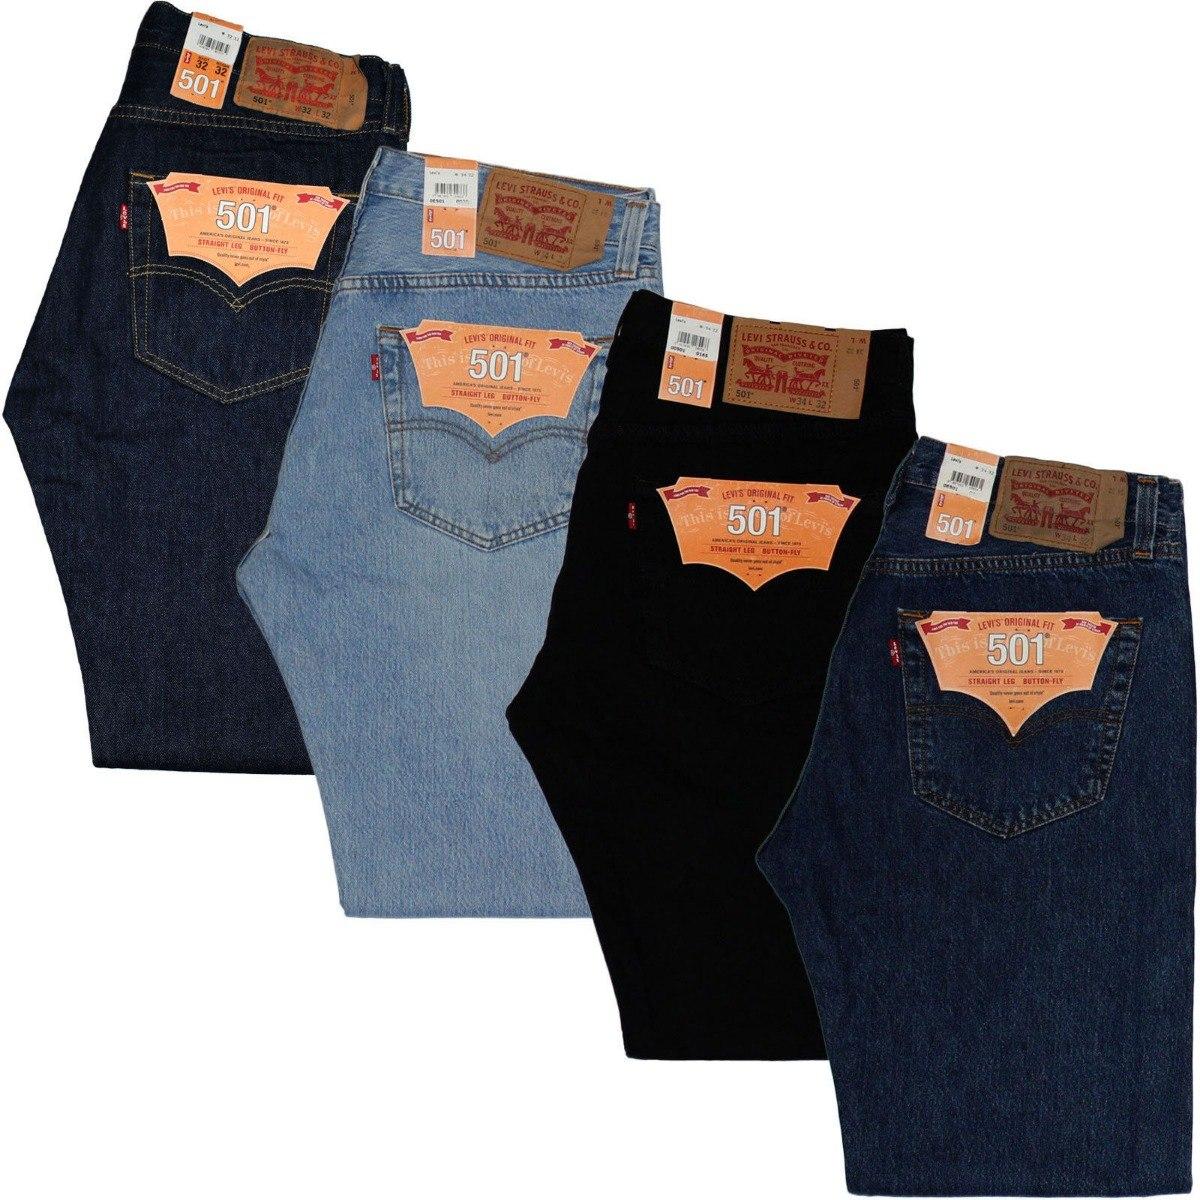 pantalones levi s 501 tallas colores en mercado libre. Black Bedroom Furniture Sets. Home Design Ideas